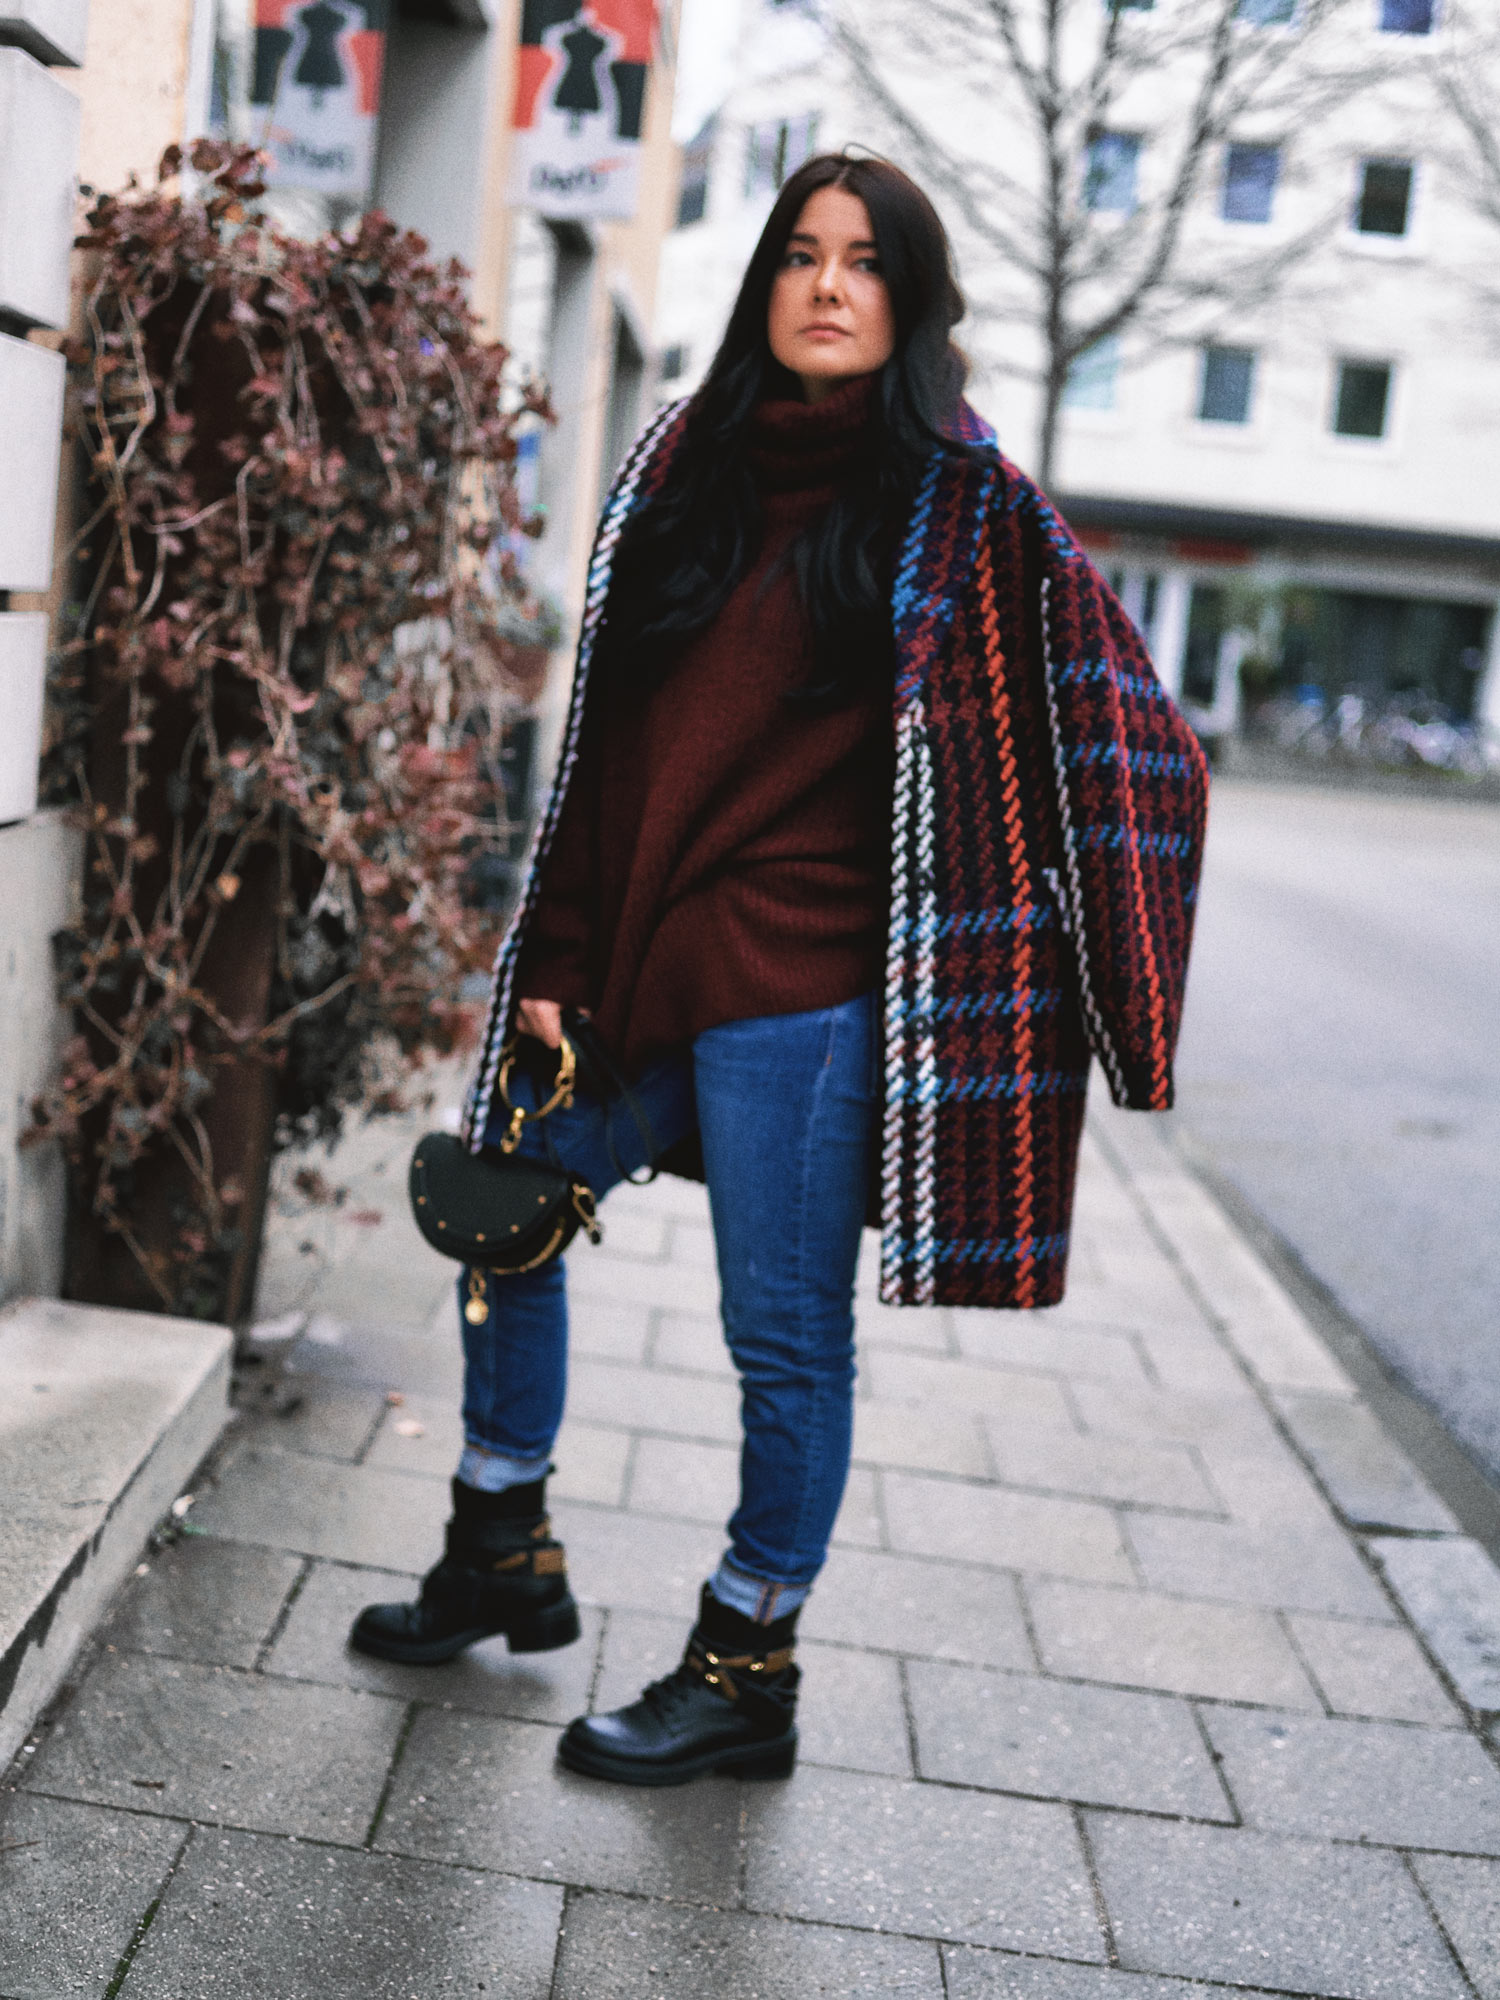 fashion-blogger-aus-muenchen-fashionblogger-lifestyleblogger-beautyblogger-fashion-blogger-modeblogger-modeblog-munich-blog-muenchen-boyfriend-style